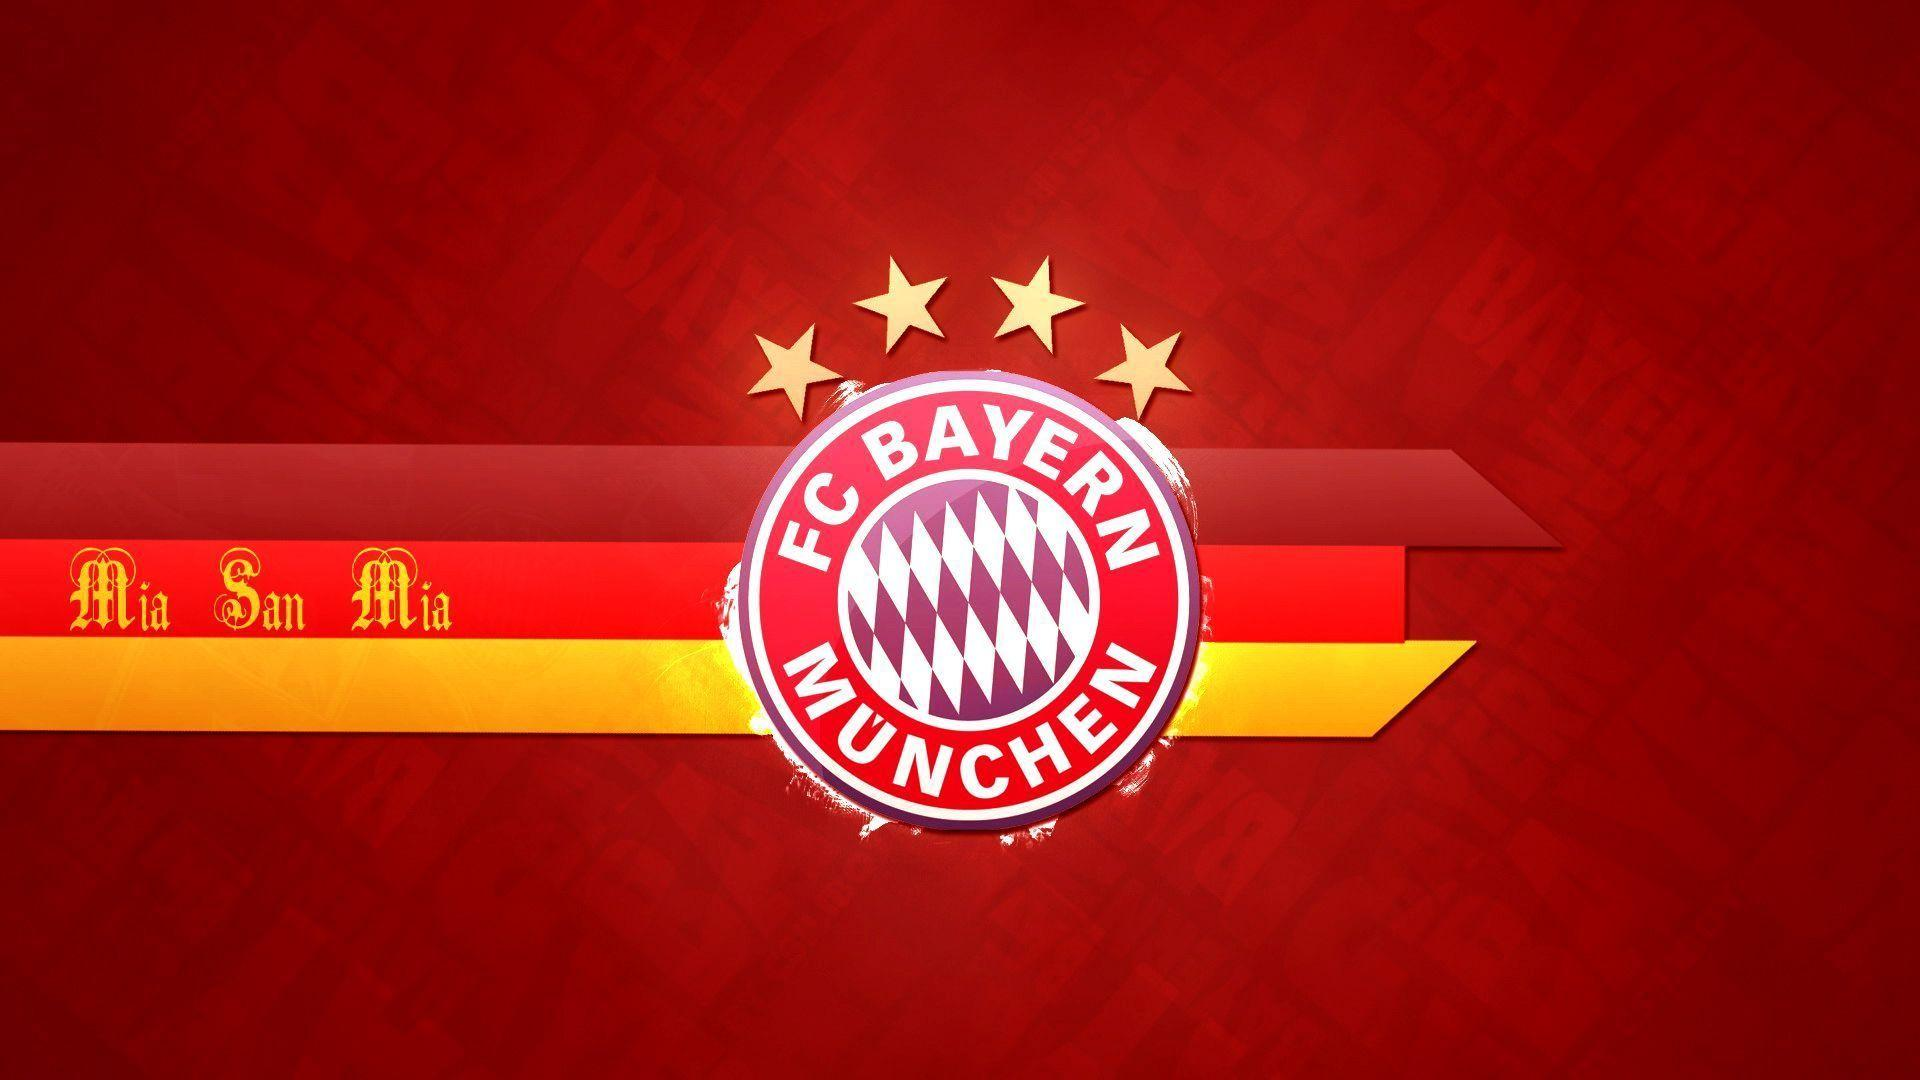 Bayern Munchen Wallpaper Background   HD Wallpapers Football Club